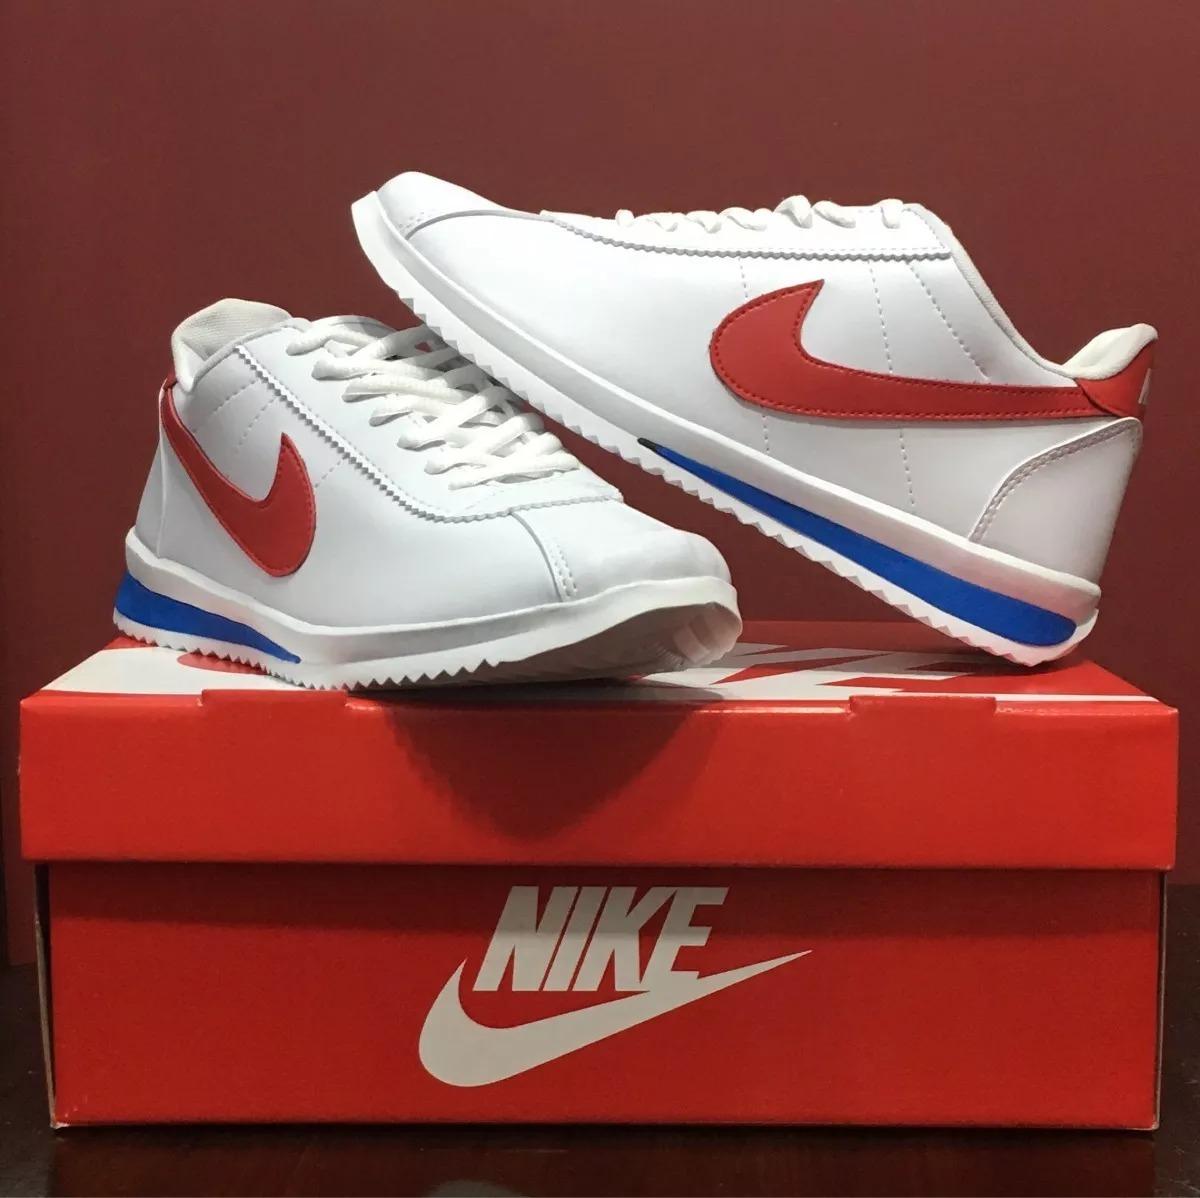 Zapatillas Nike 41 Classic Cortez Dama Talle 35 Al 41 Nike  00 en e7332d